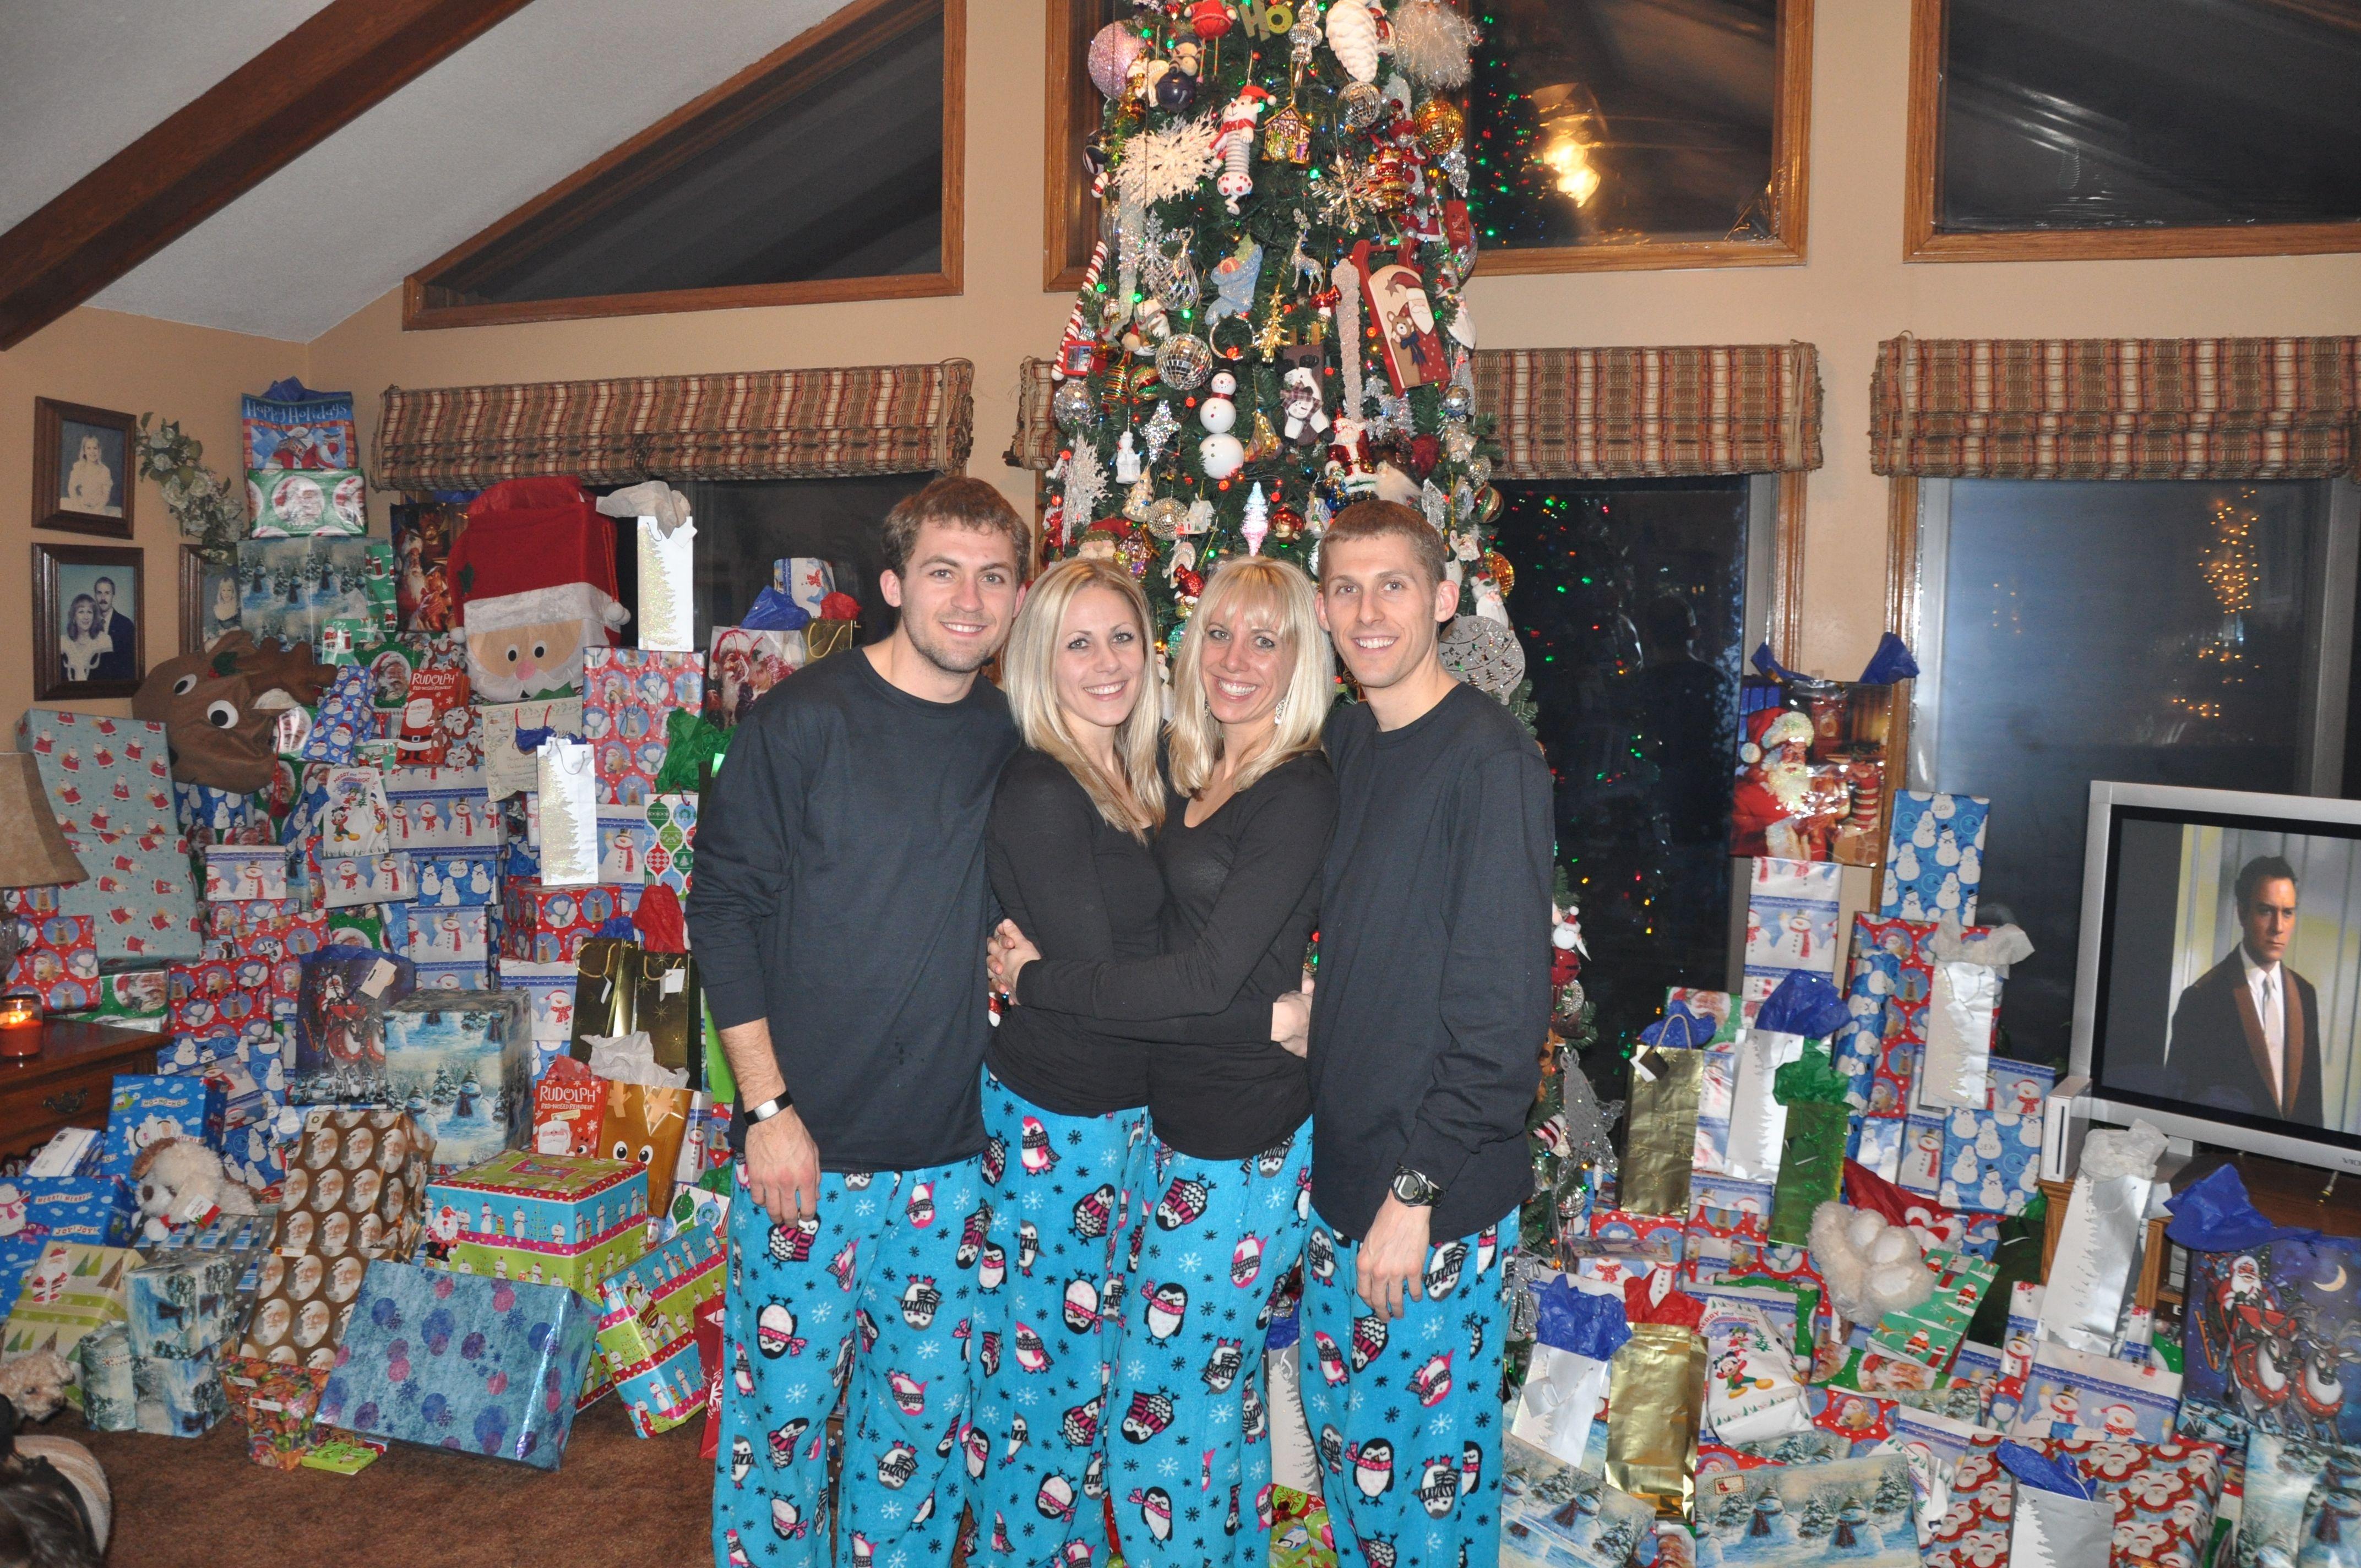 matching family pajamas | The Local Elite